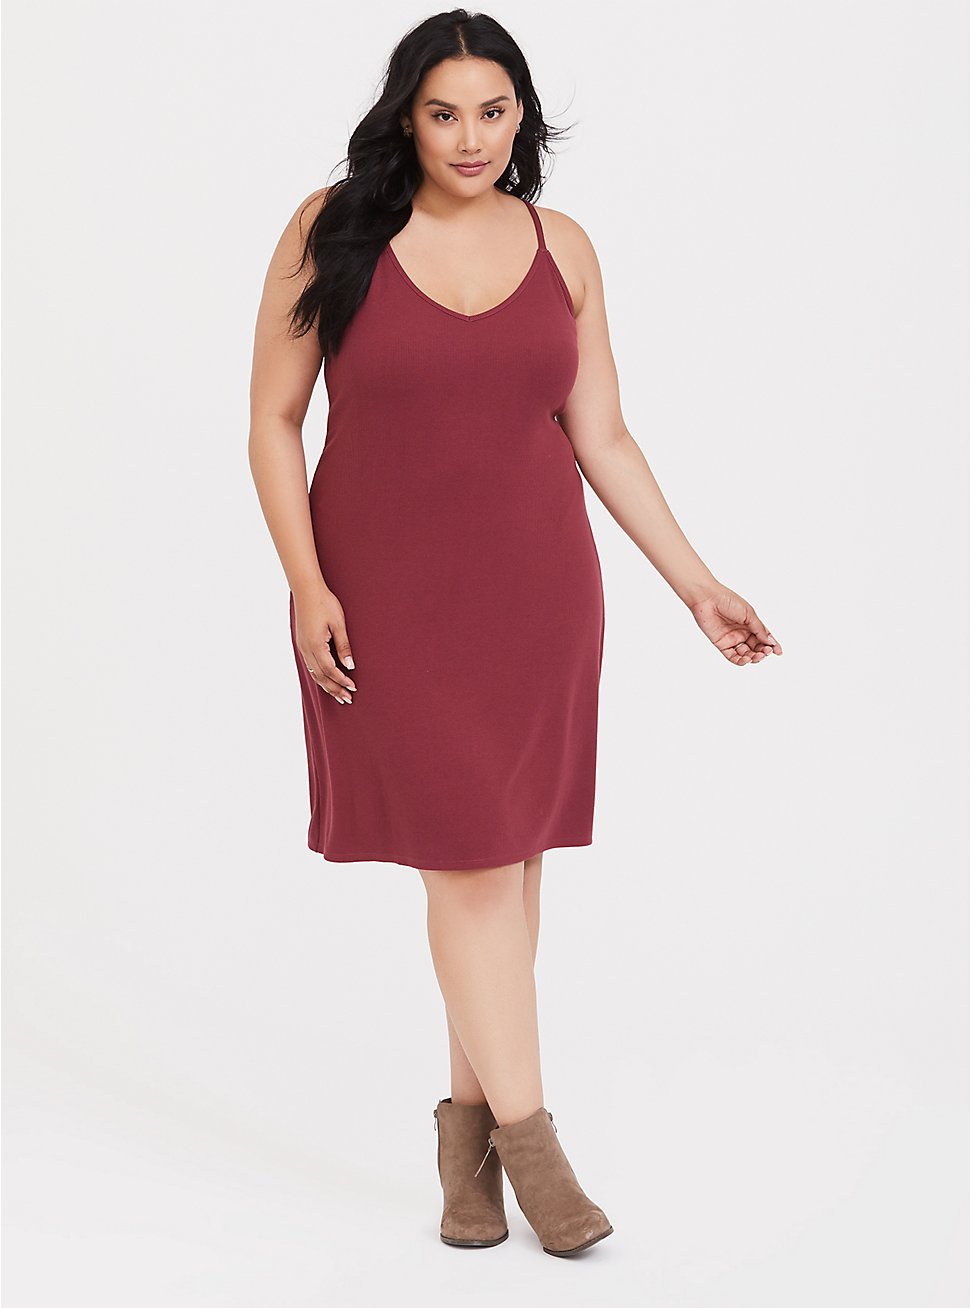 first look buy sale 100% high quality Plus Size - Dark Red Rib Mini Slip Dress - Torrid